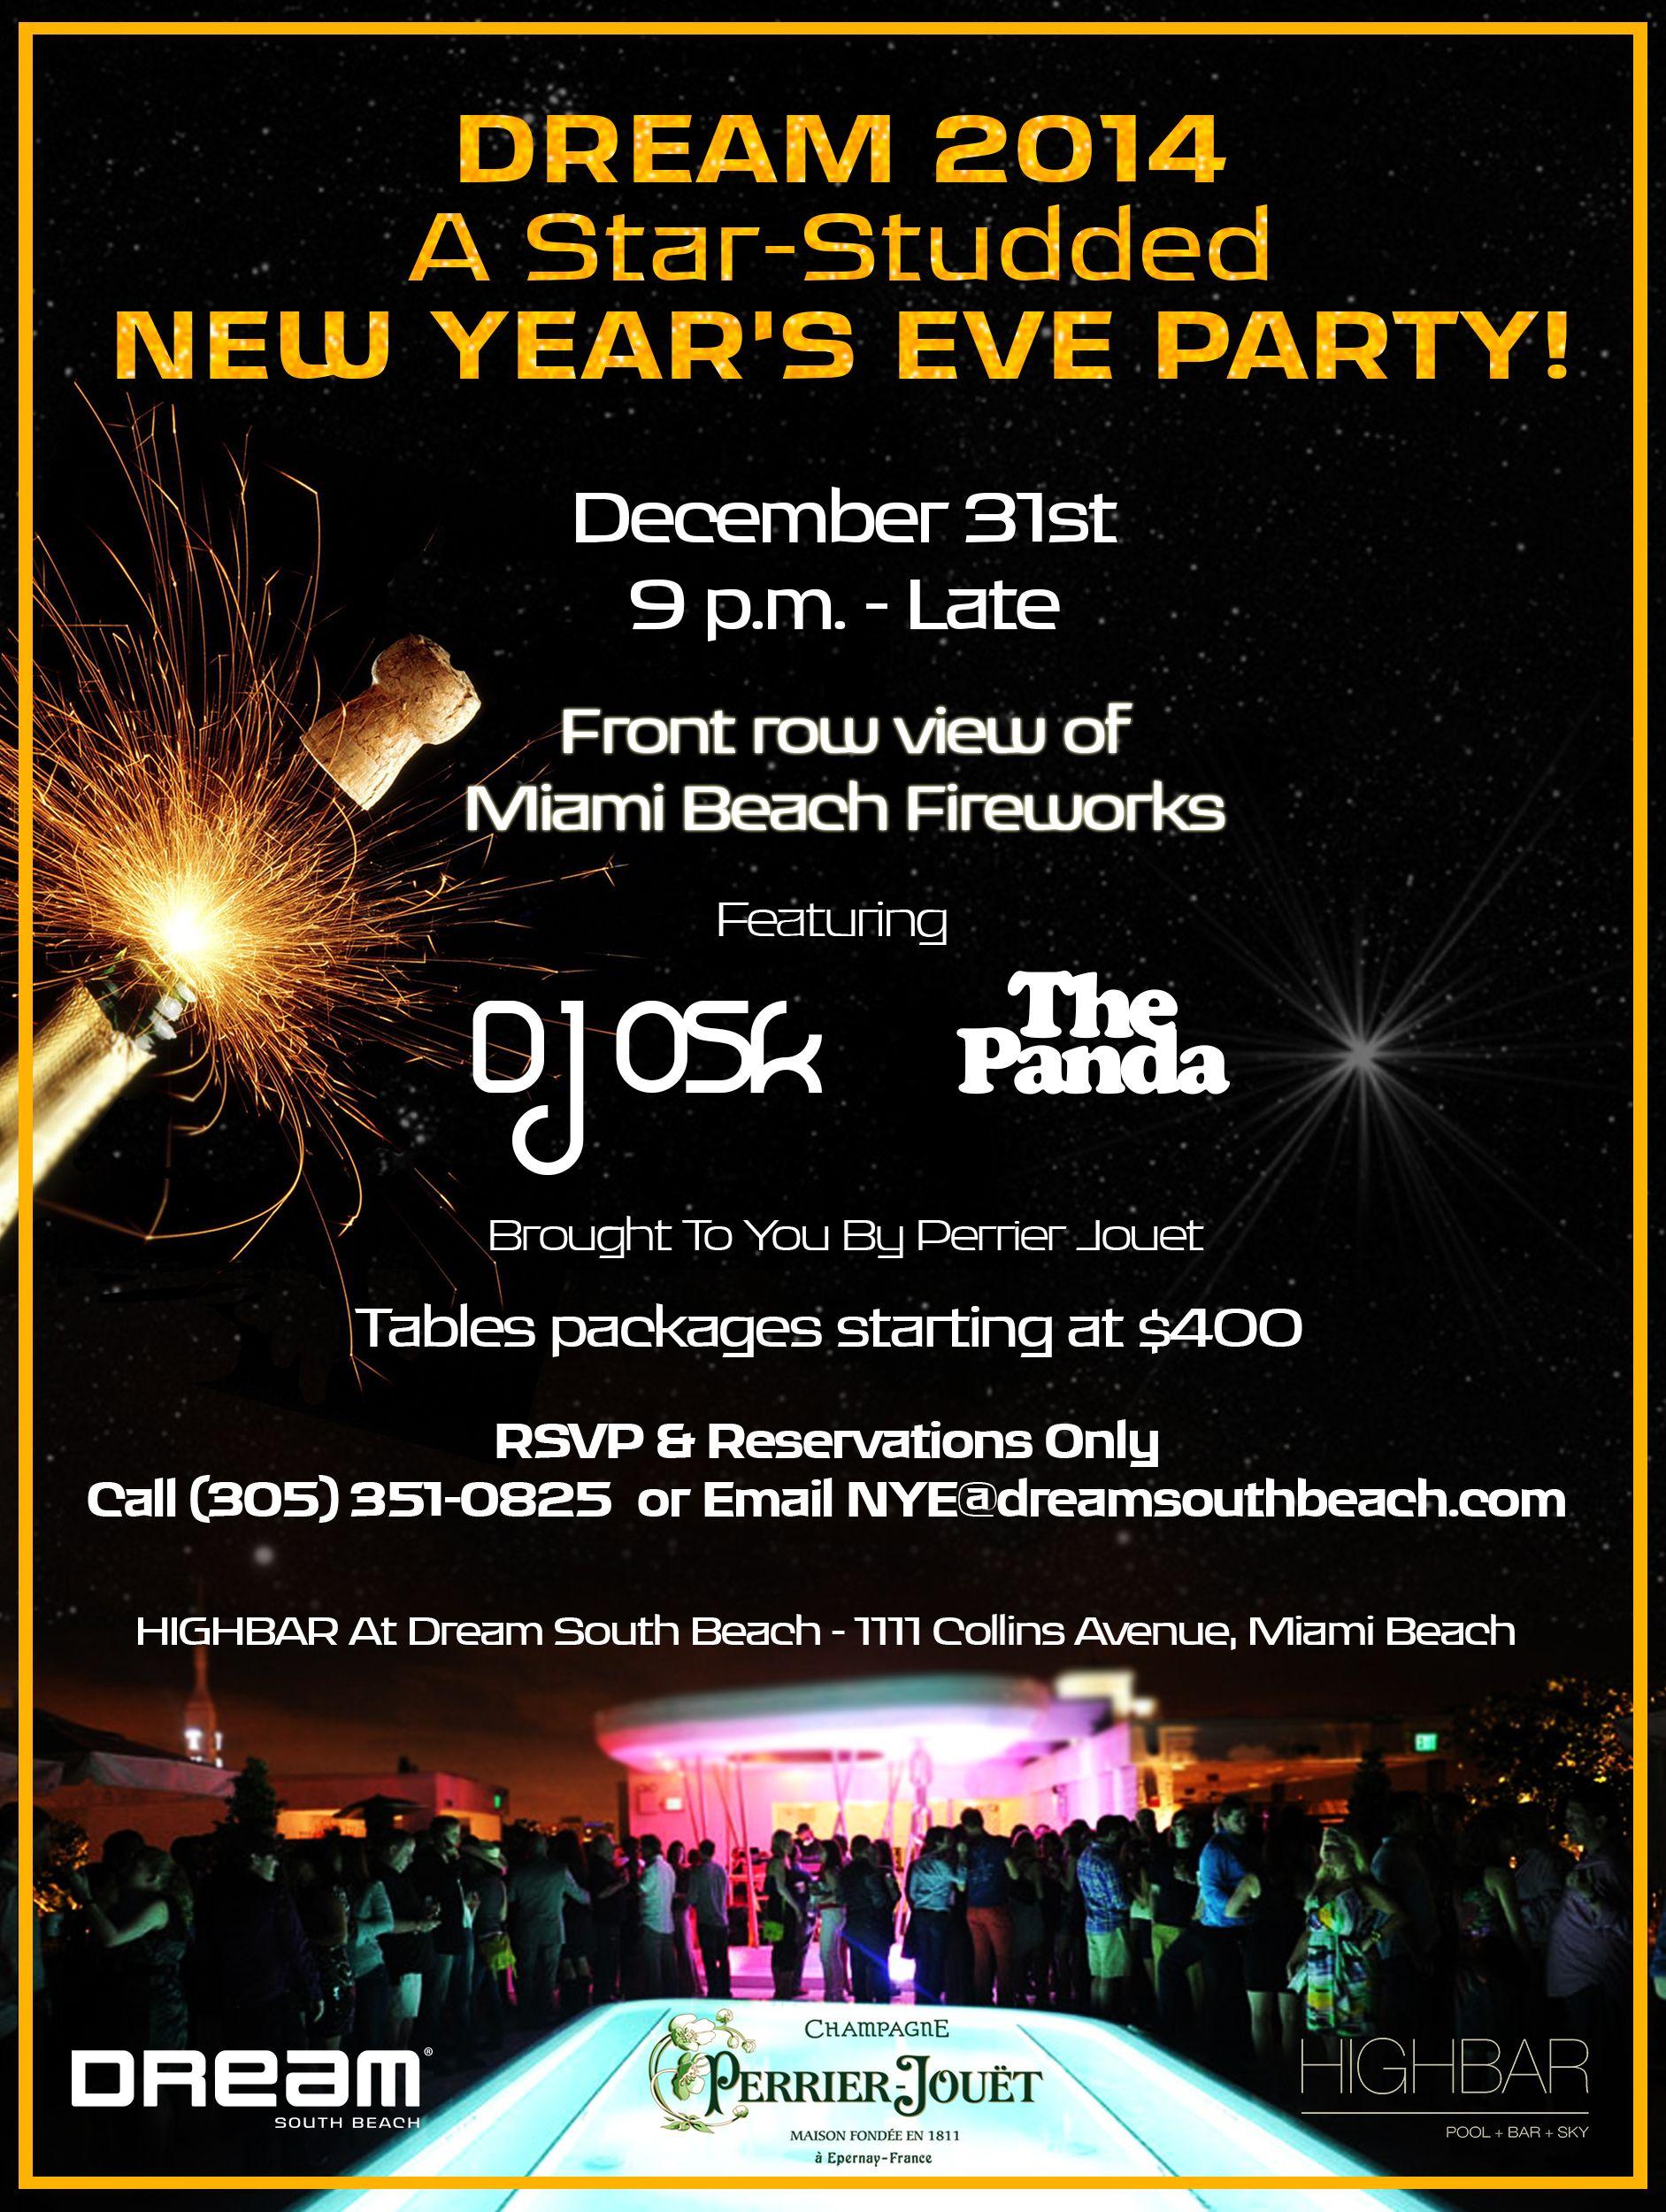 Nye S Party Nye Party Highbar Southbeacg Late Nights Nye Party South Beach Miami Beach